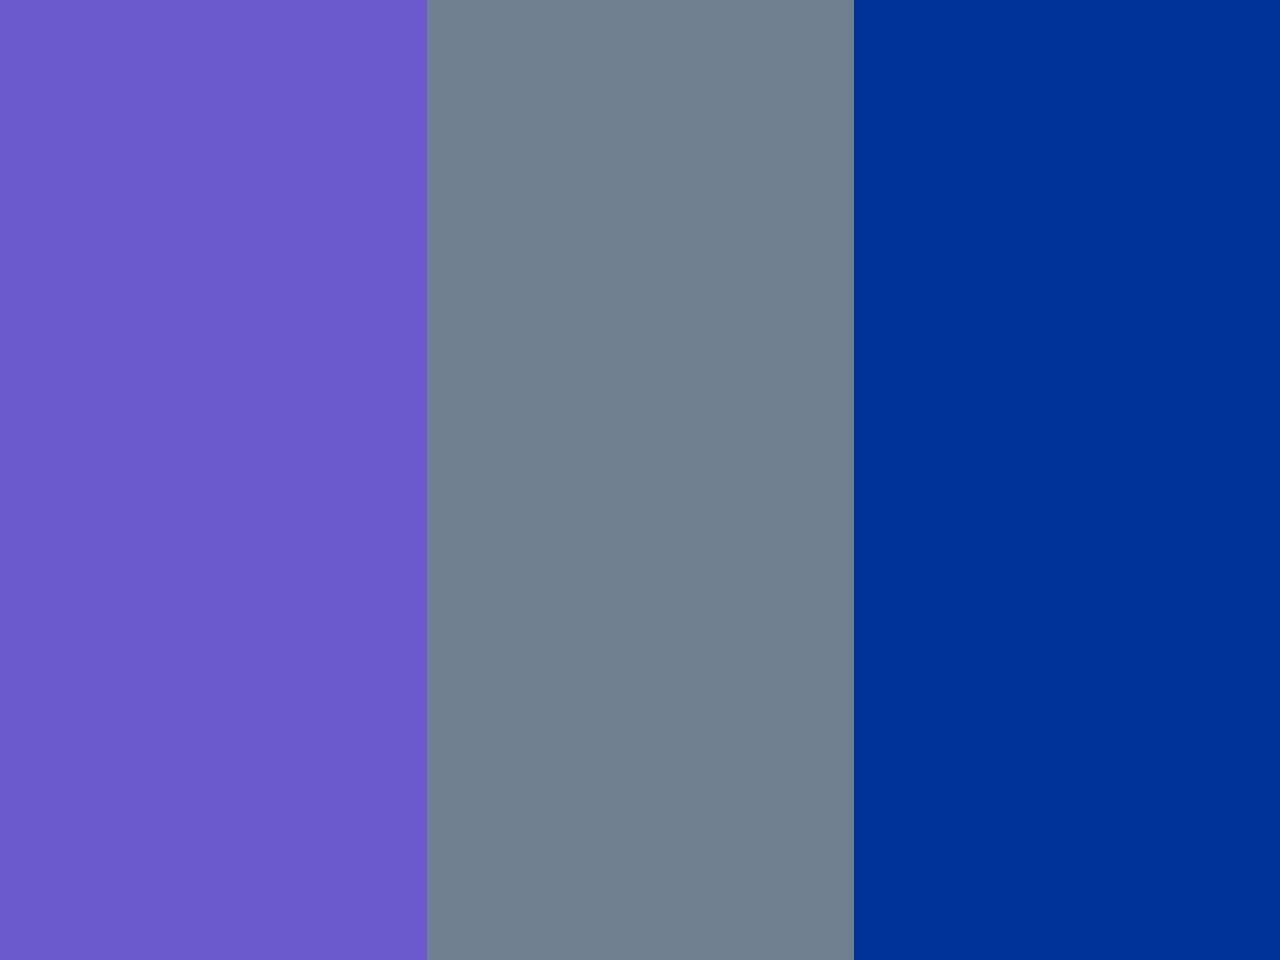 Blue Slate Gray and Smalt Dark Powder Blue Three Color Background 1280x960